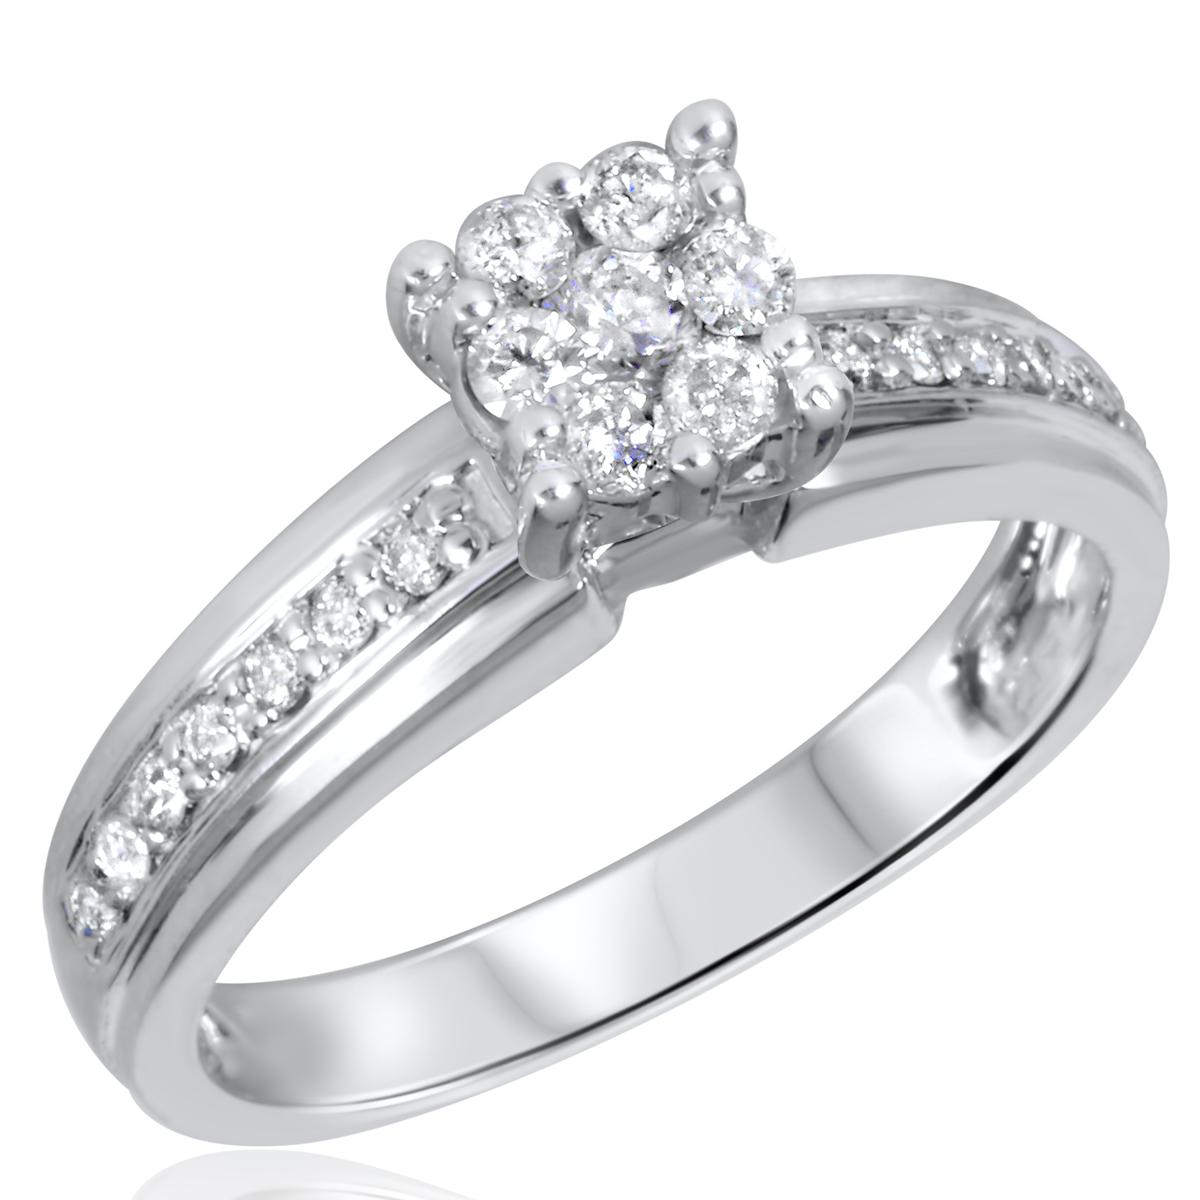 1/3 CT. T.W. Diamond Ladies Engagement Ring 14K White Gold- Size 8